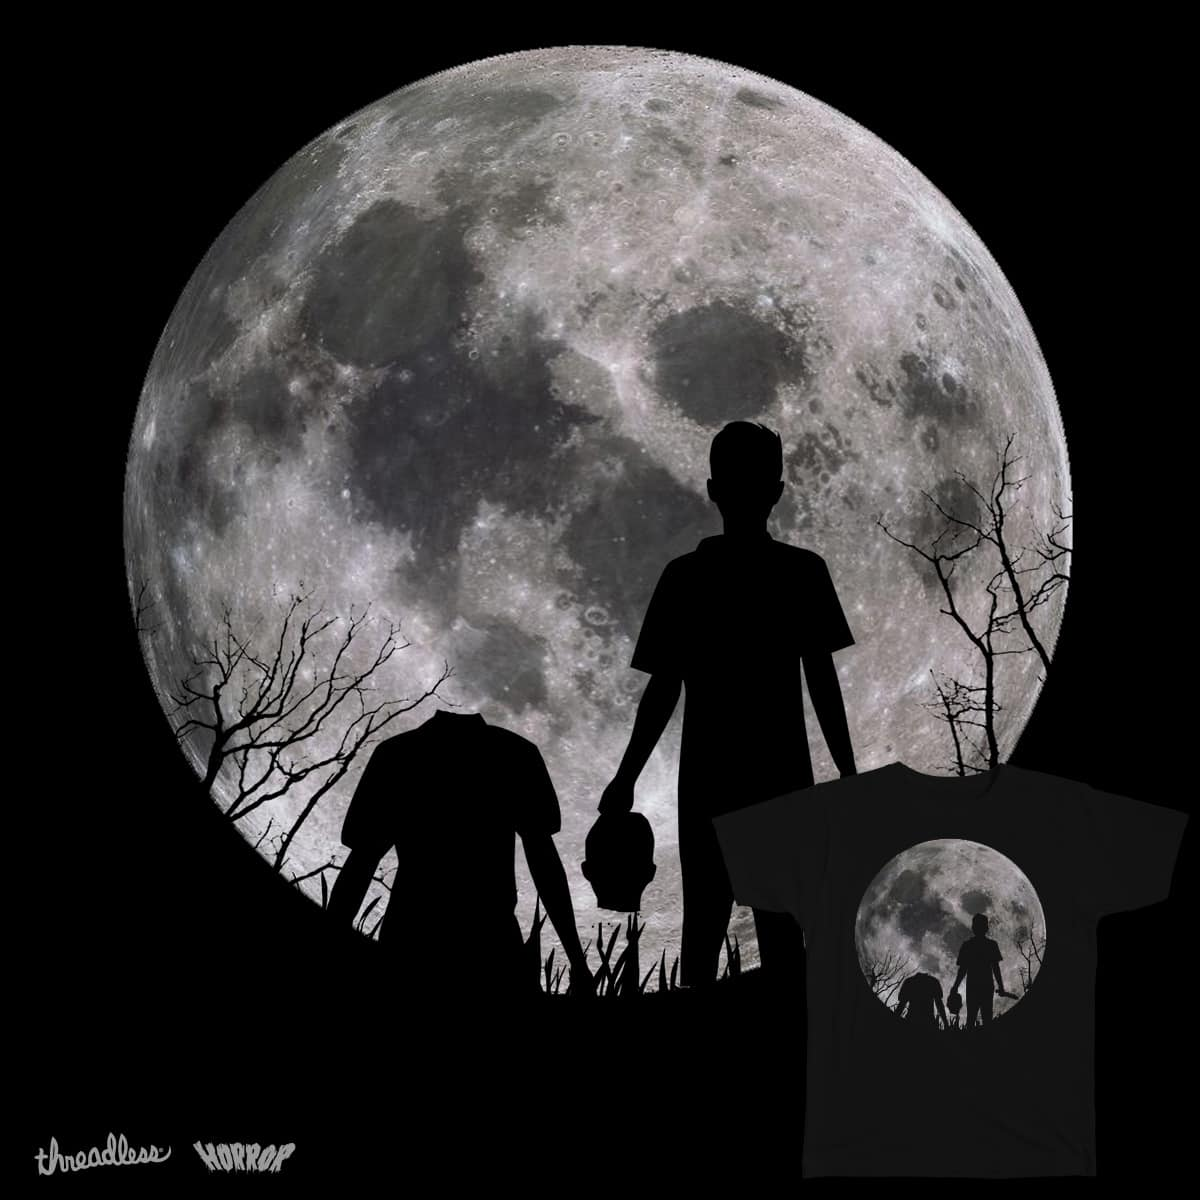 night of murder by bobbynuryusuf on Threadless